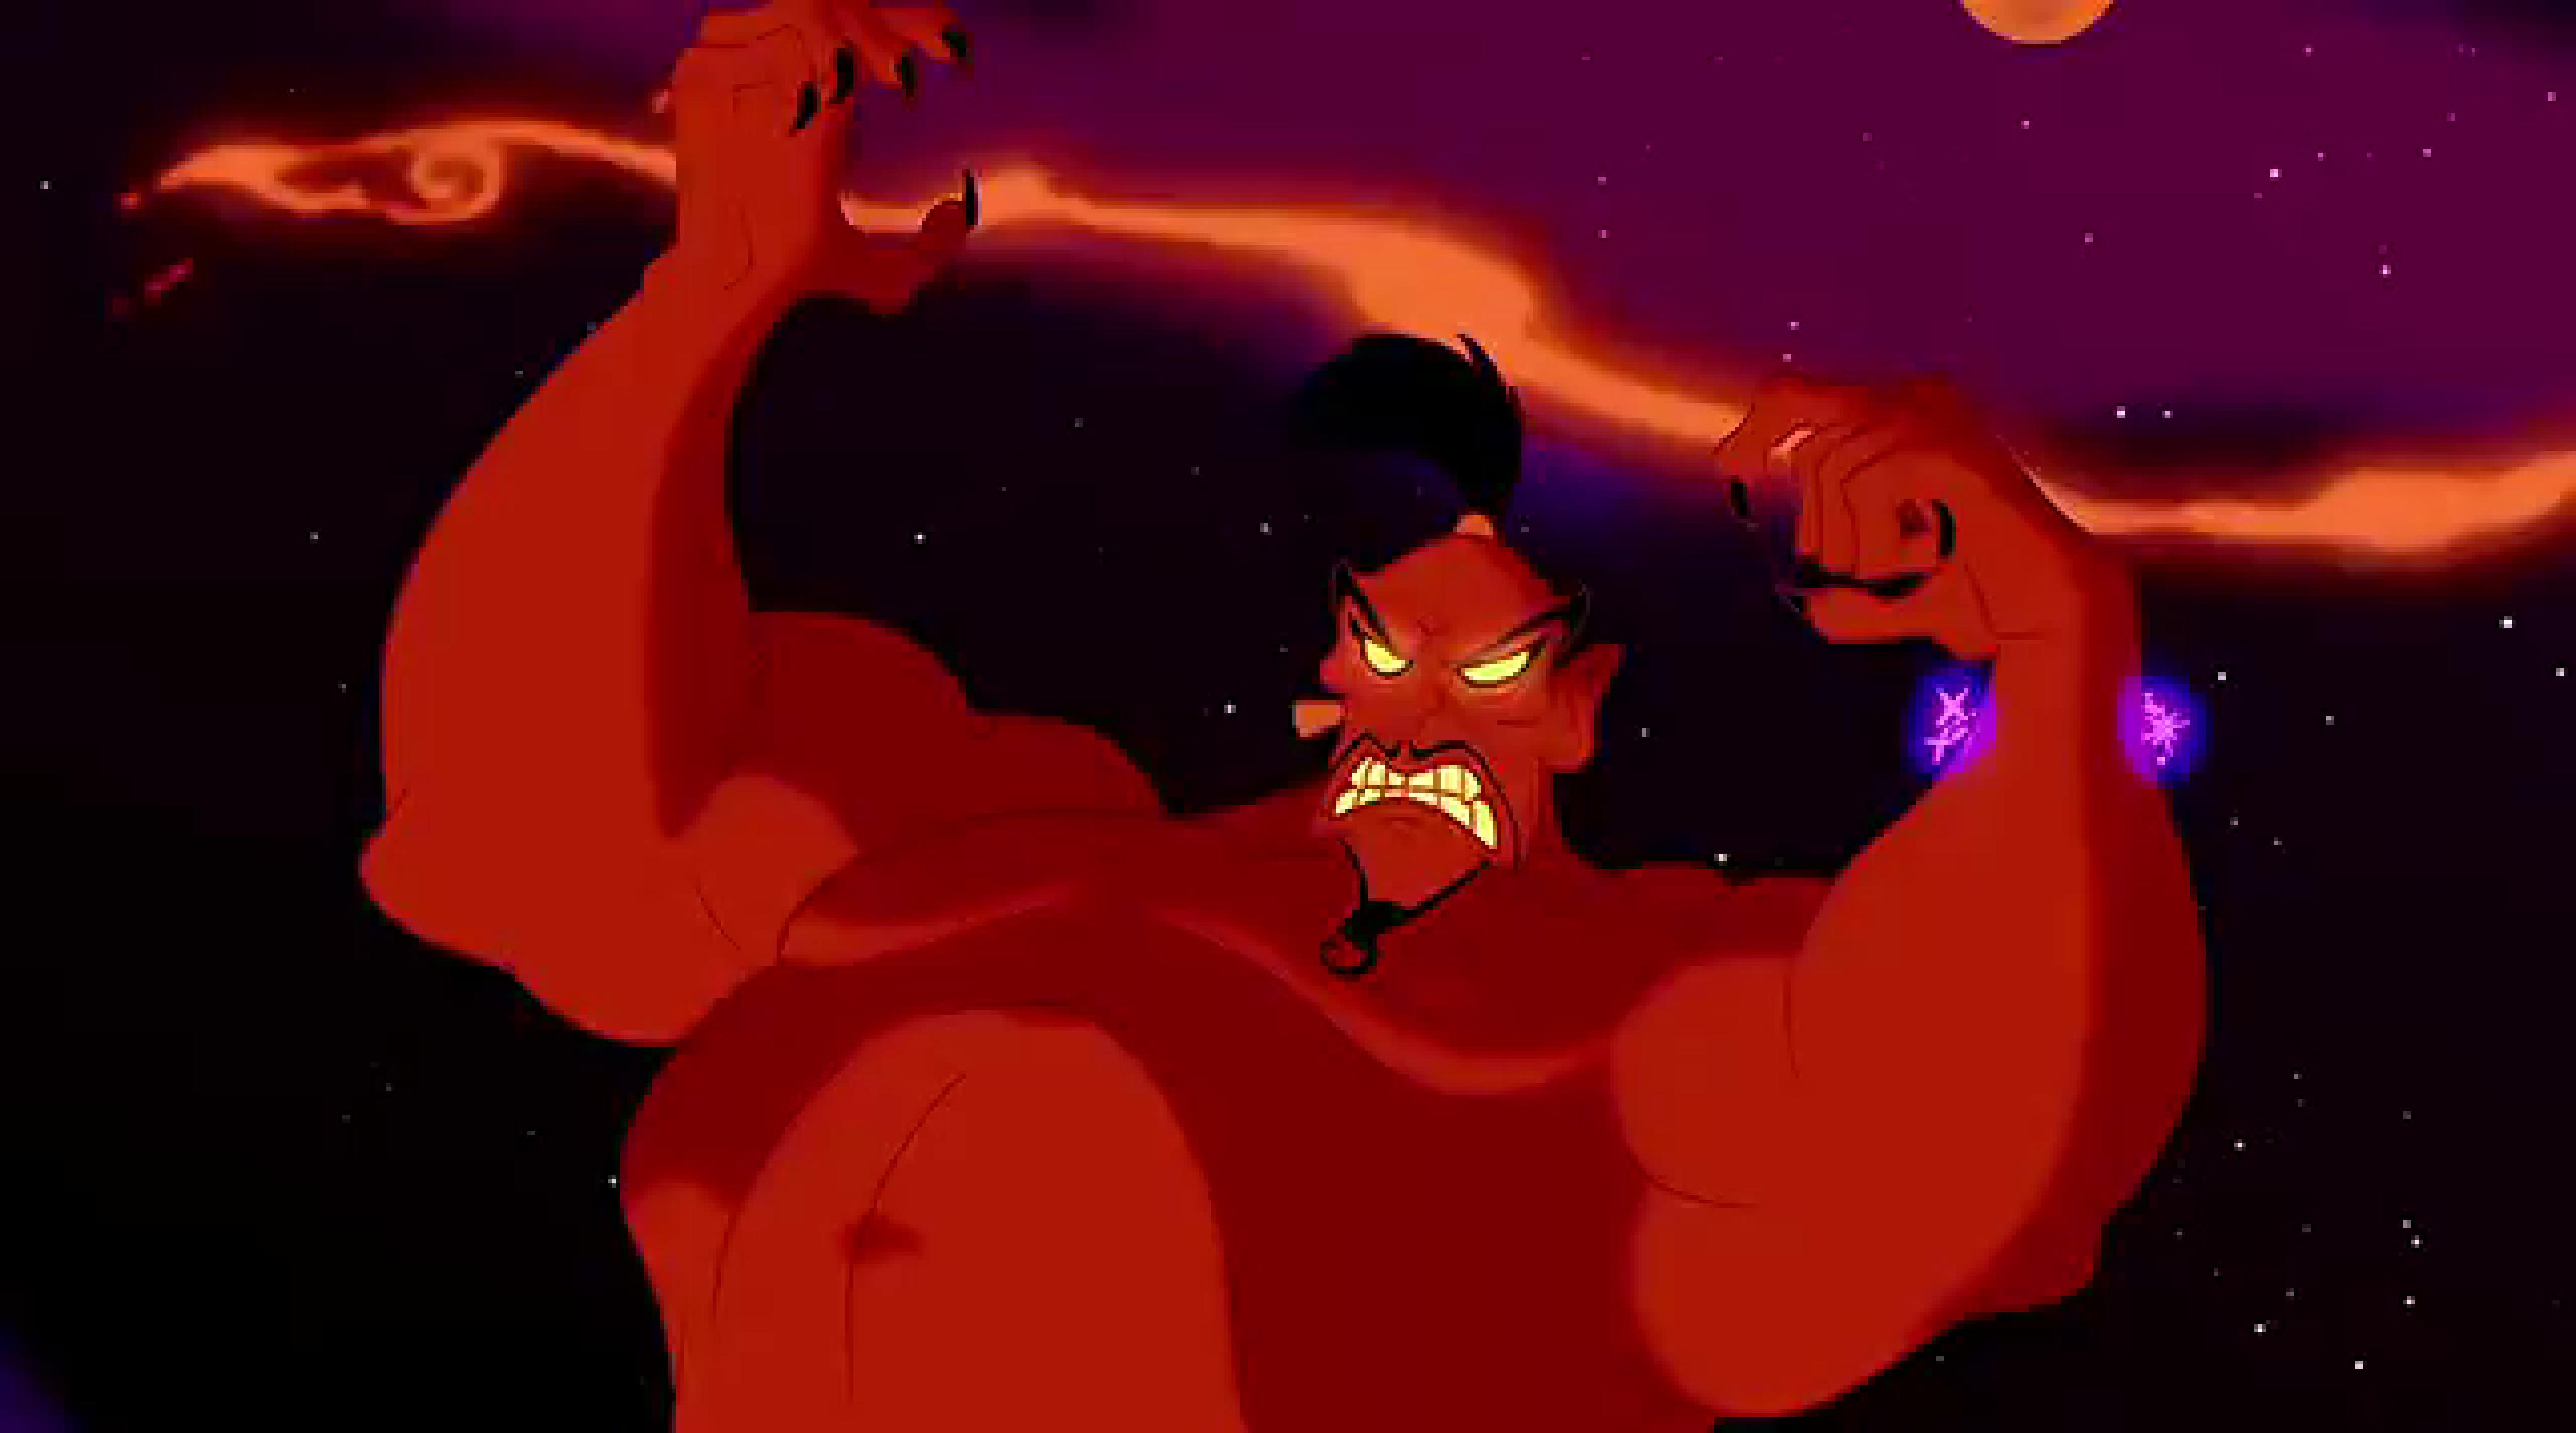 Image Genie Jafar Part 5 Png Wickedpedia Fandom